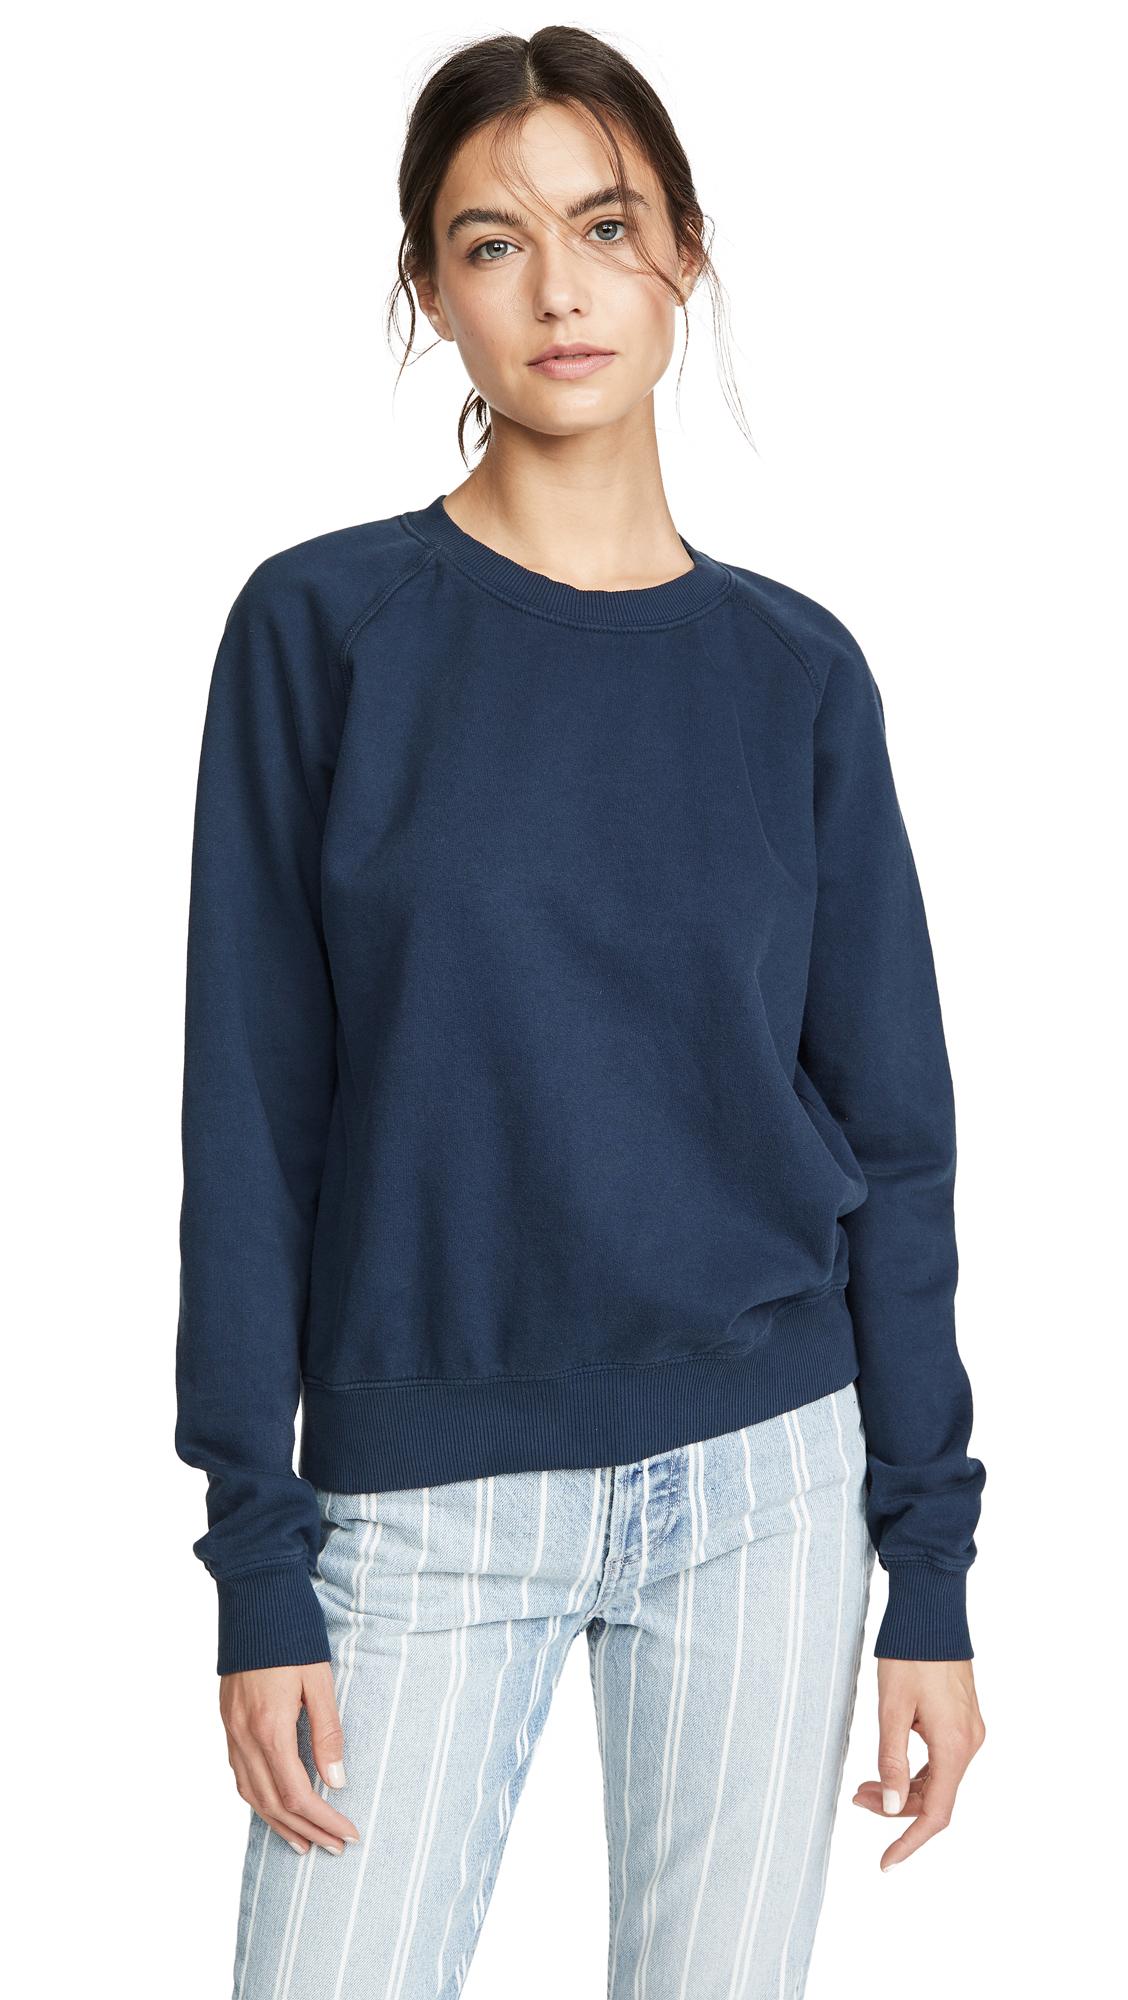 x karla The Crew Sweatshirt – 30% Off Sale